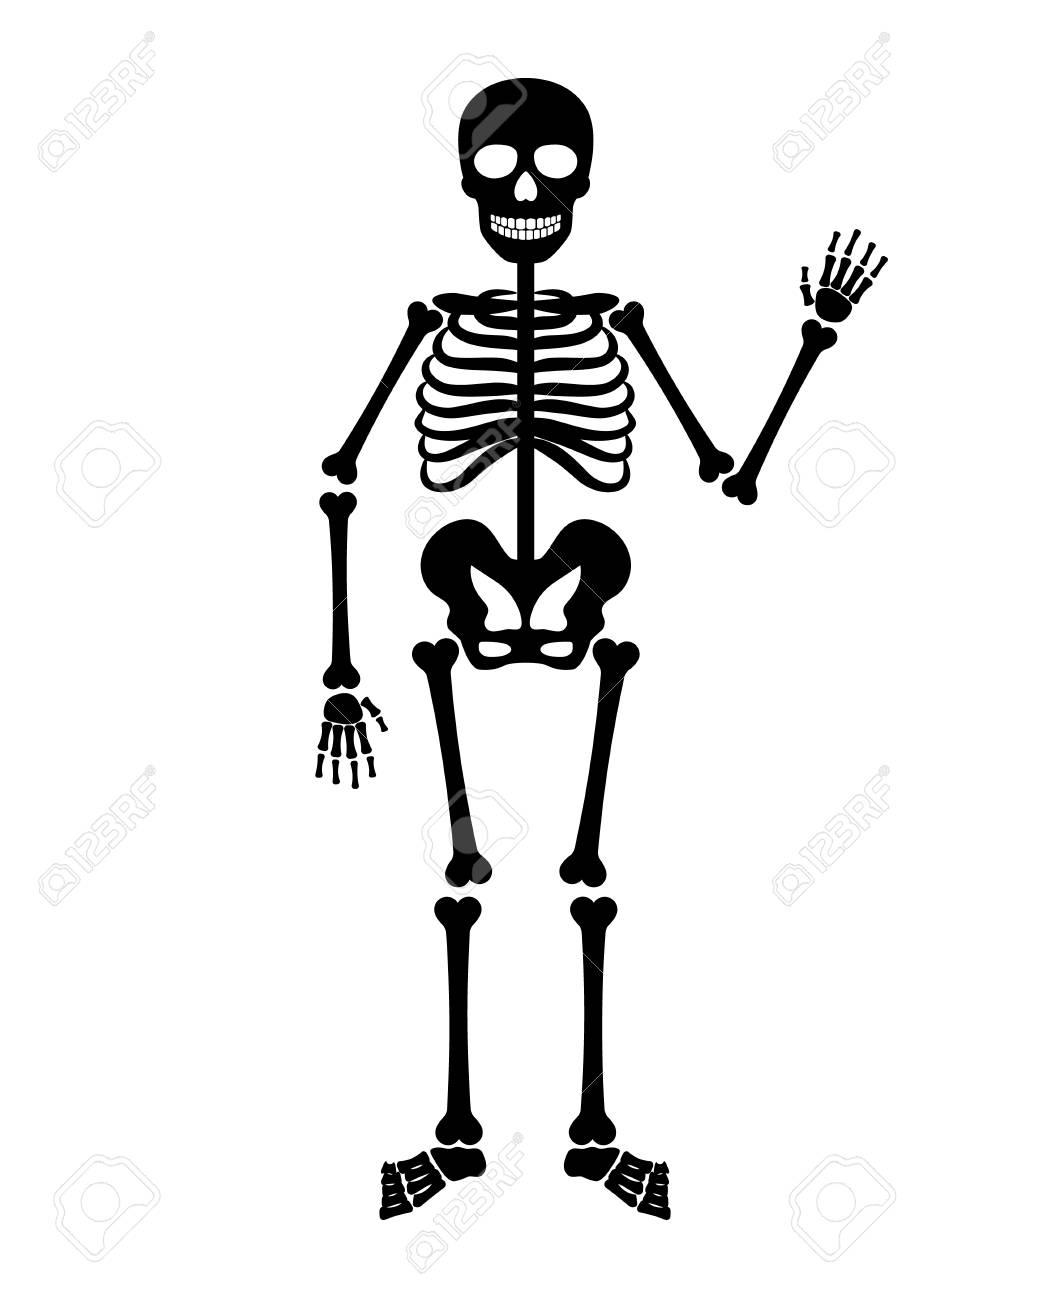 skeleton human anatomy vector halloween black skeleton isolated rh 123rf com skeleton vector illustration free skeleton vector illustration free